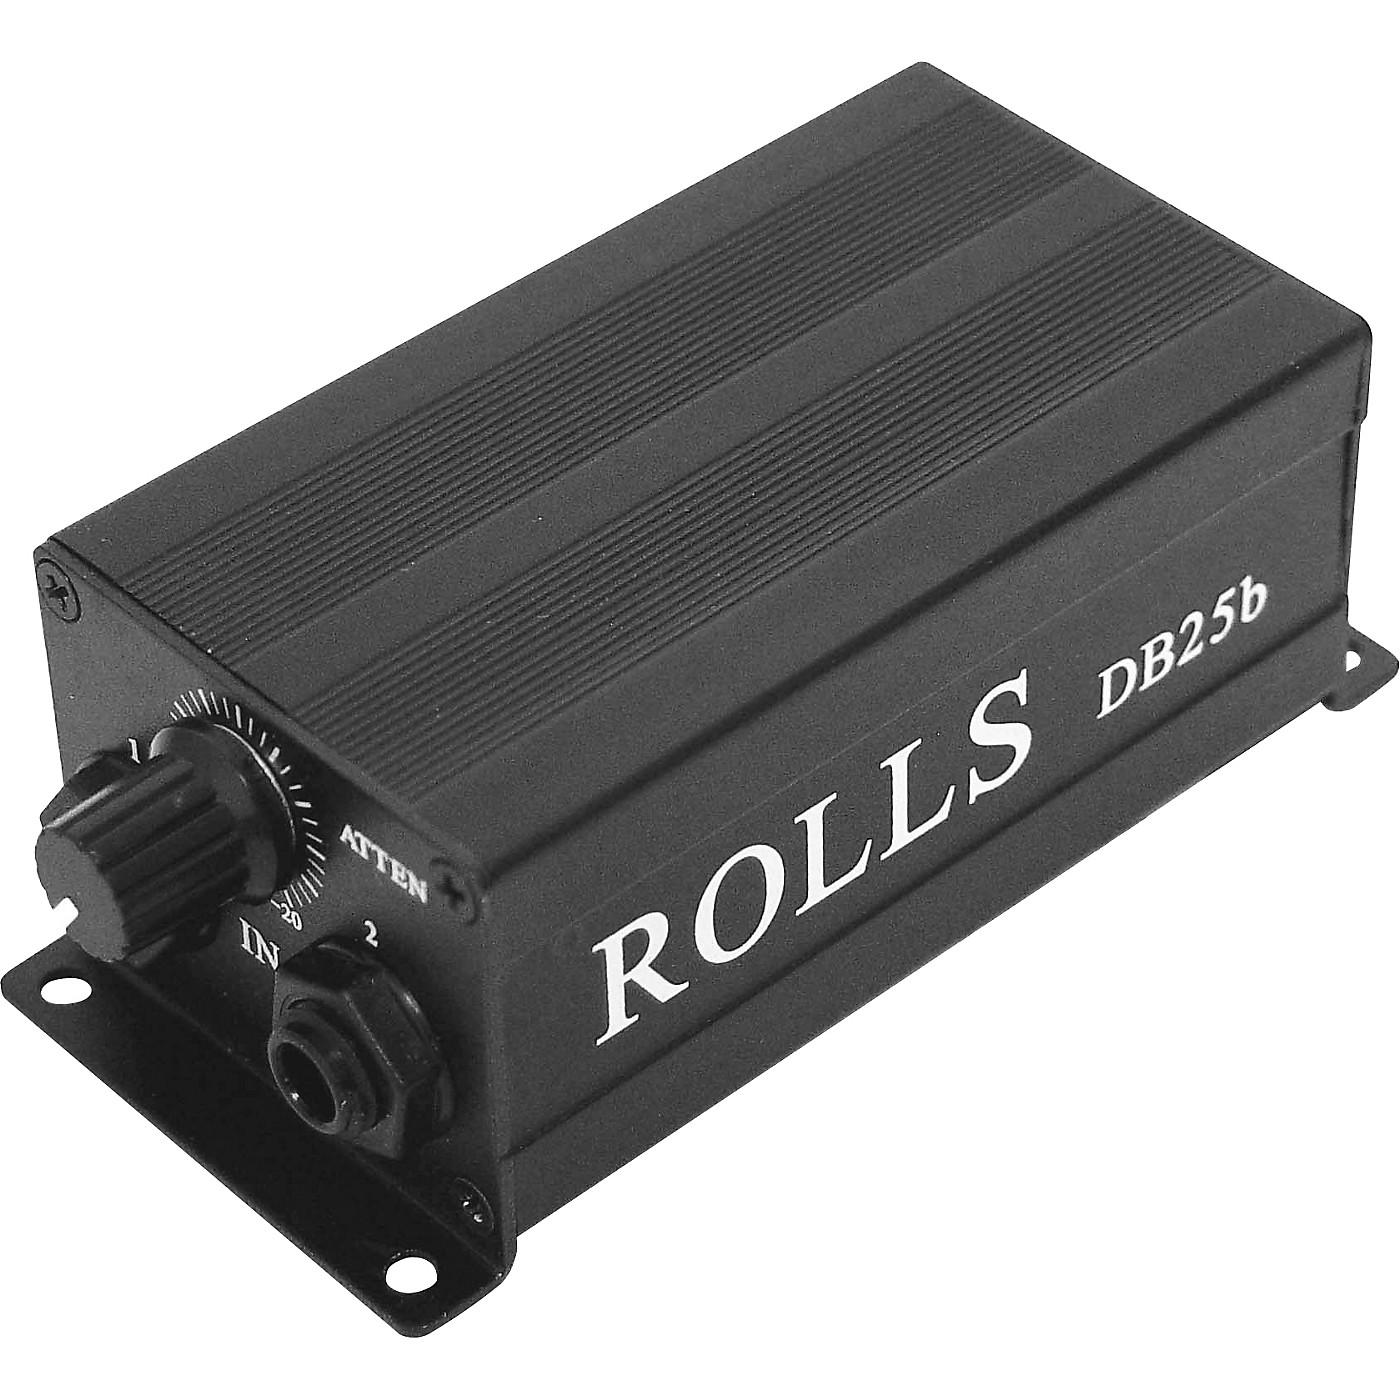 Rolls DB25b Direct Box/Pad/Ground Lift thumbnail